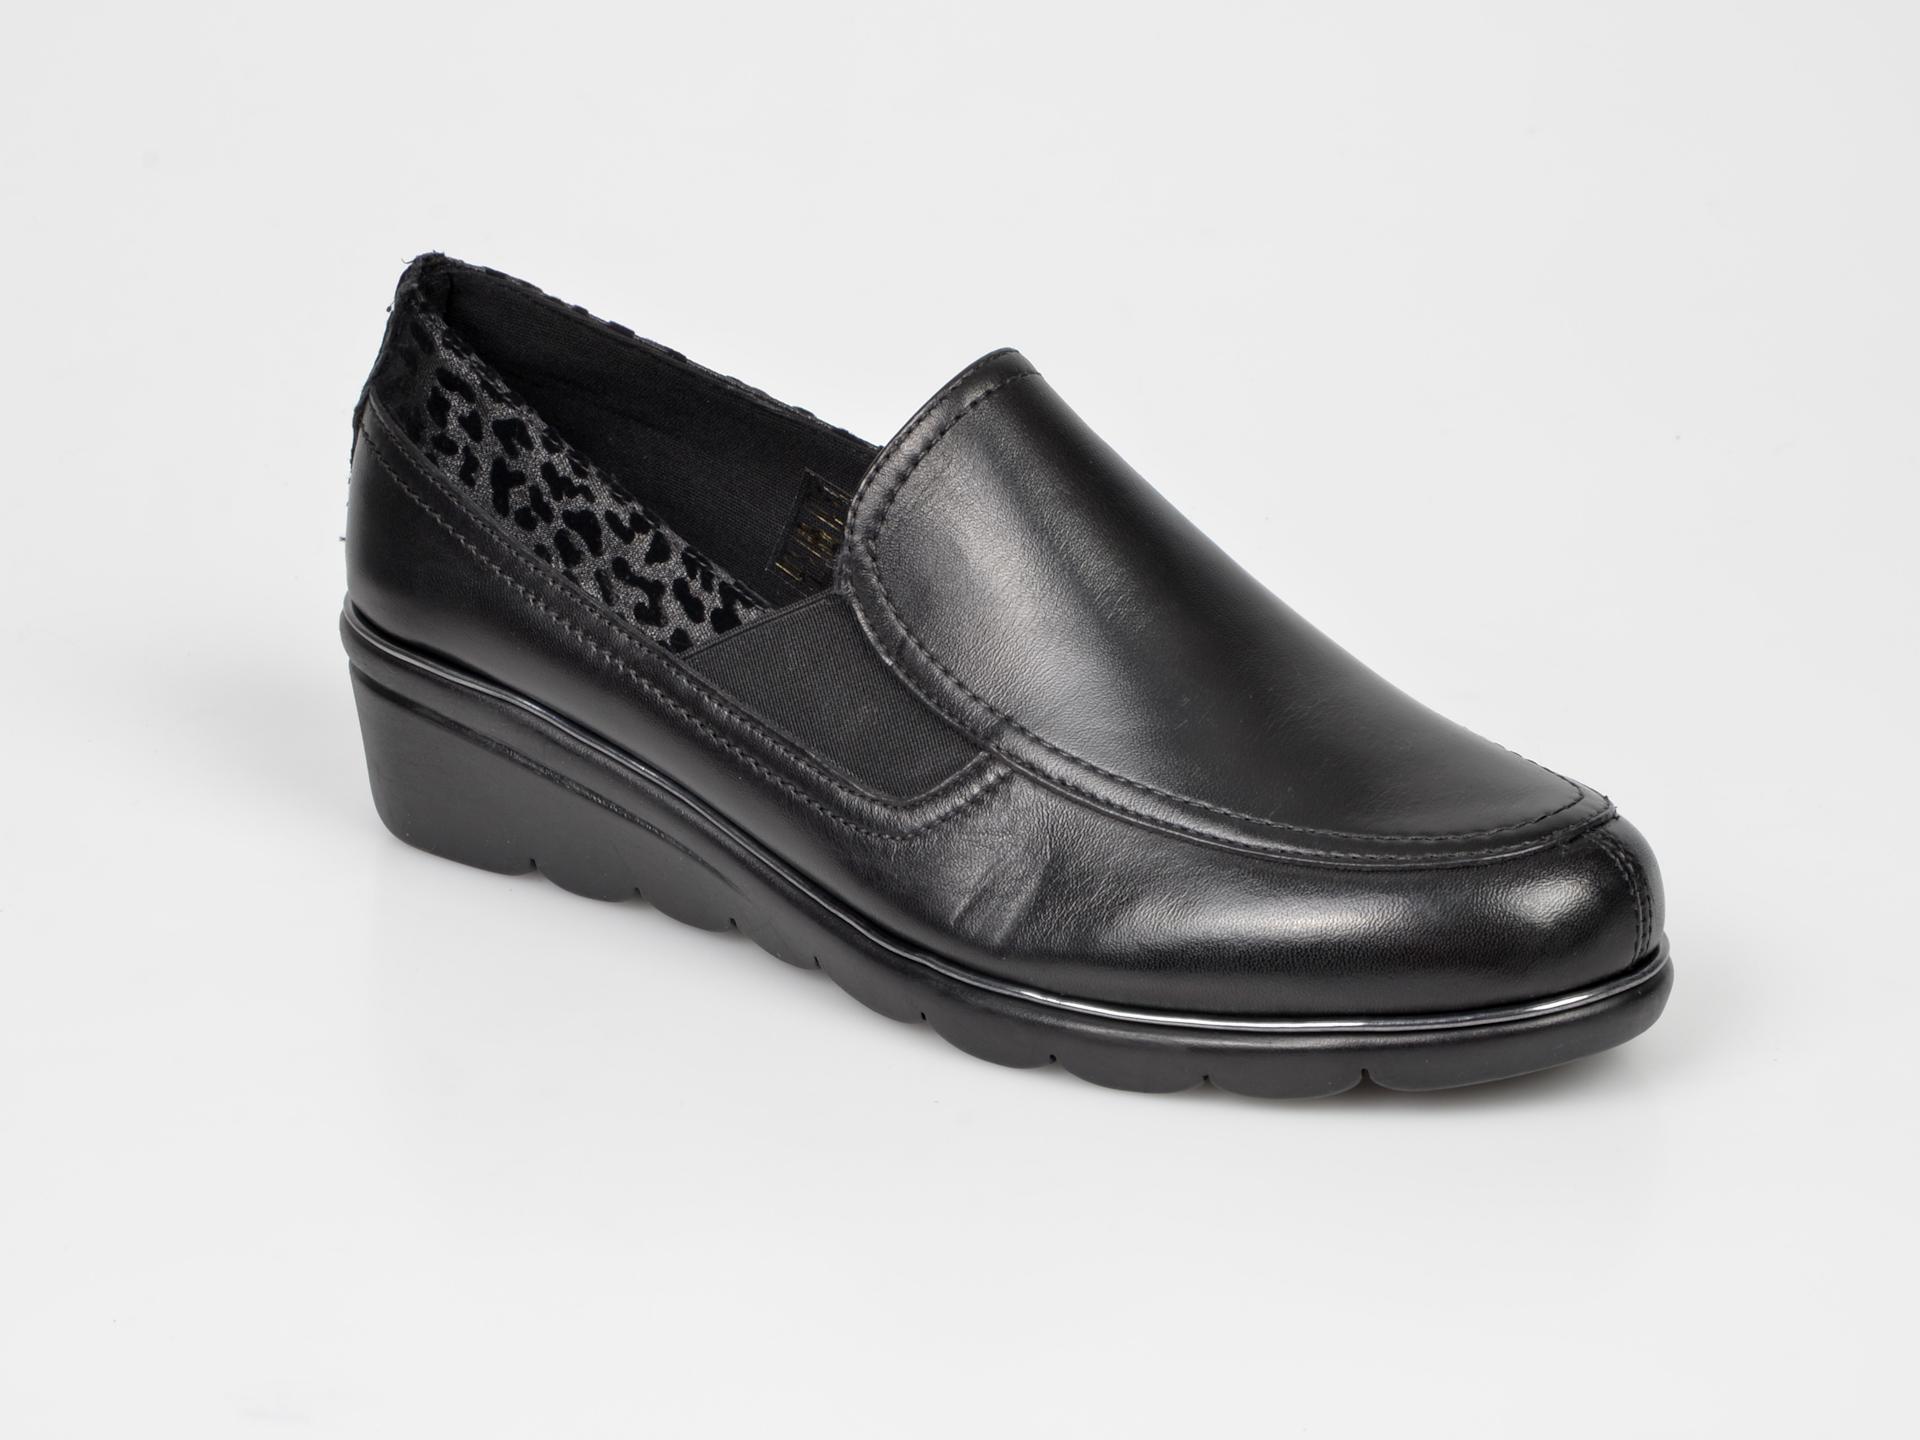 Pantofi The FLEXX negri, Boombox, din piele naturala